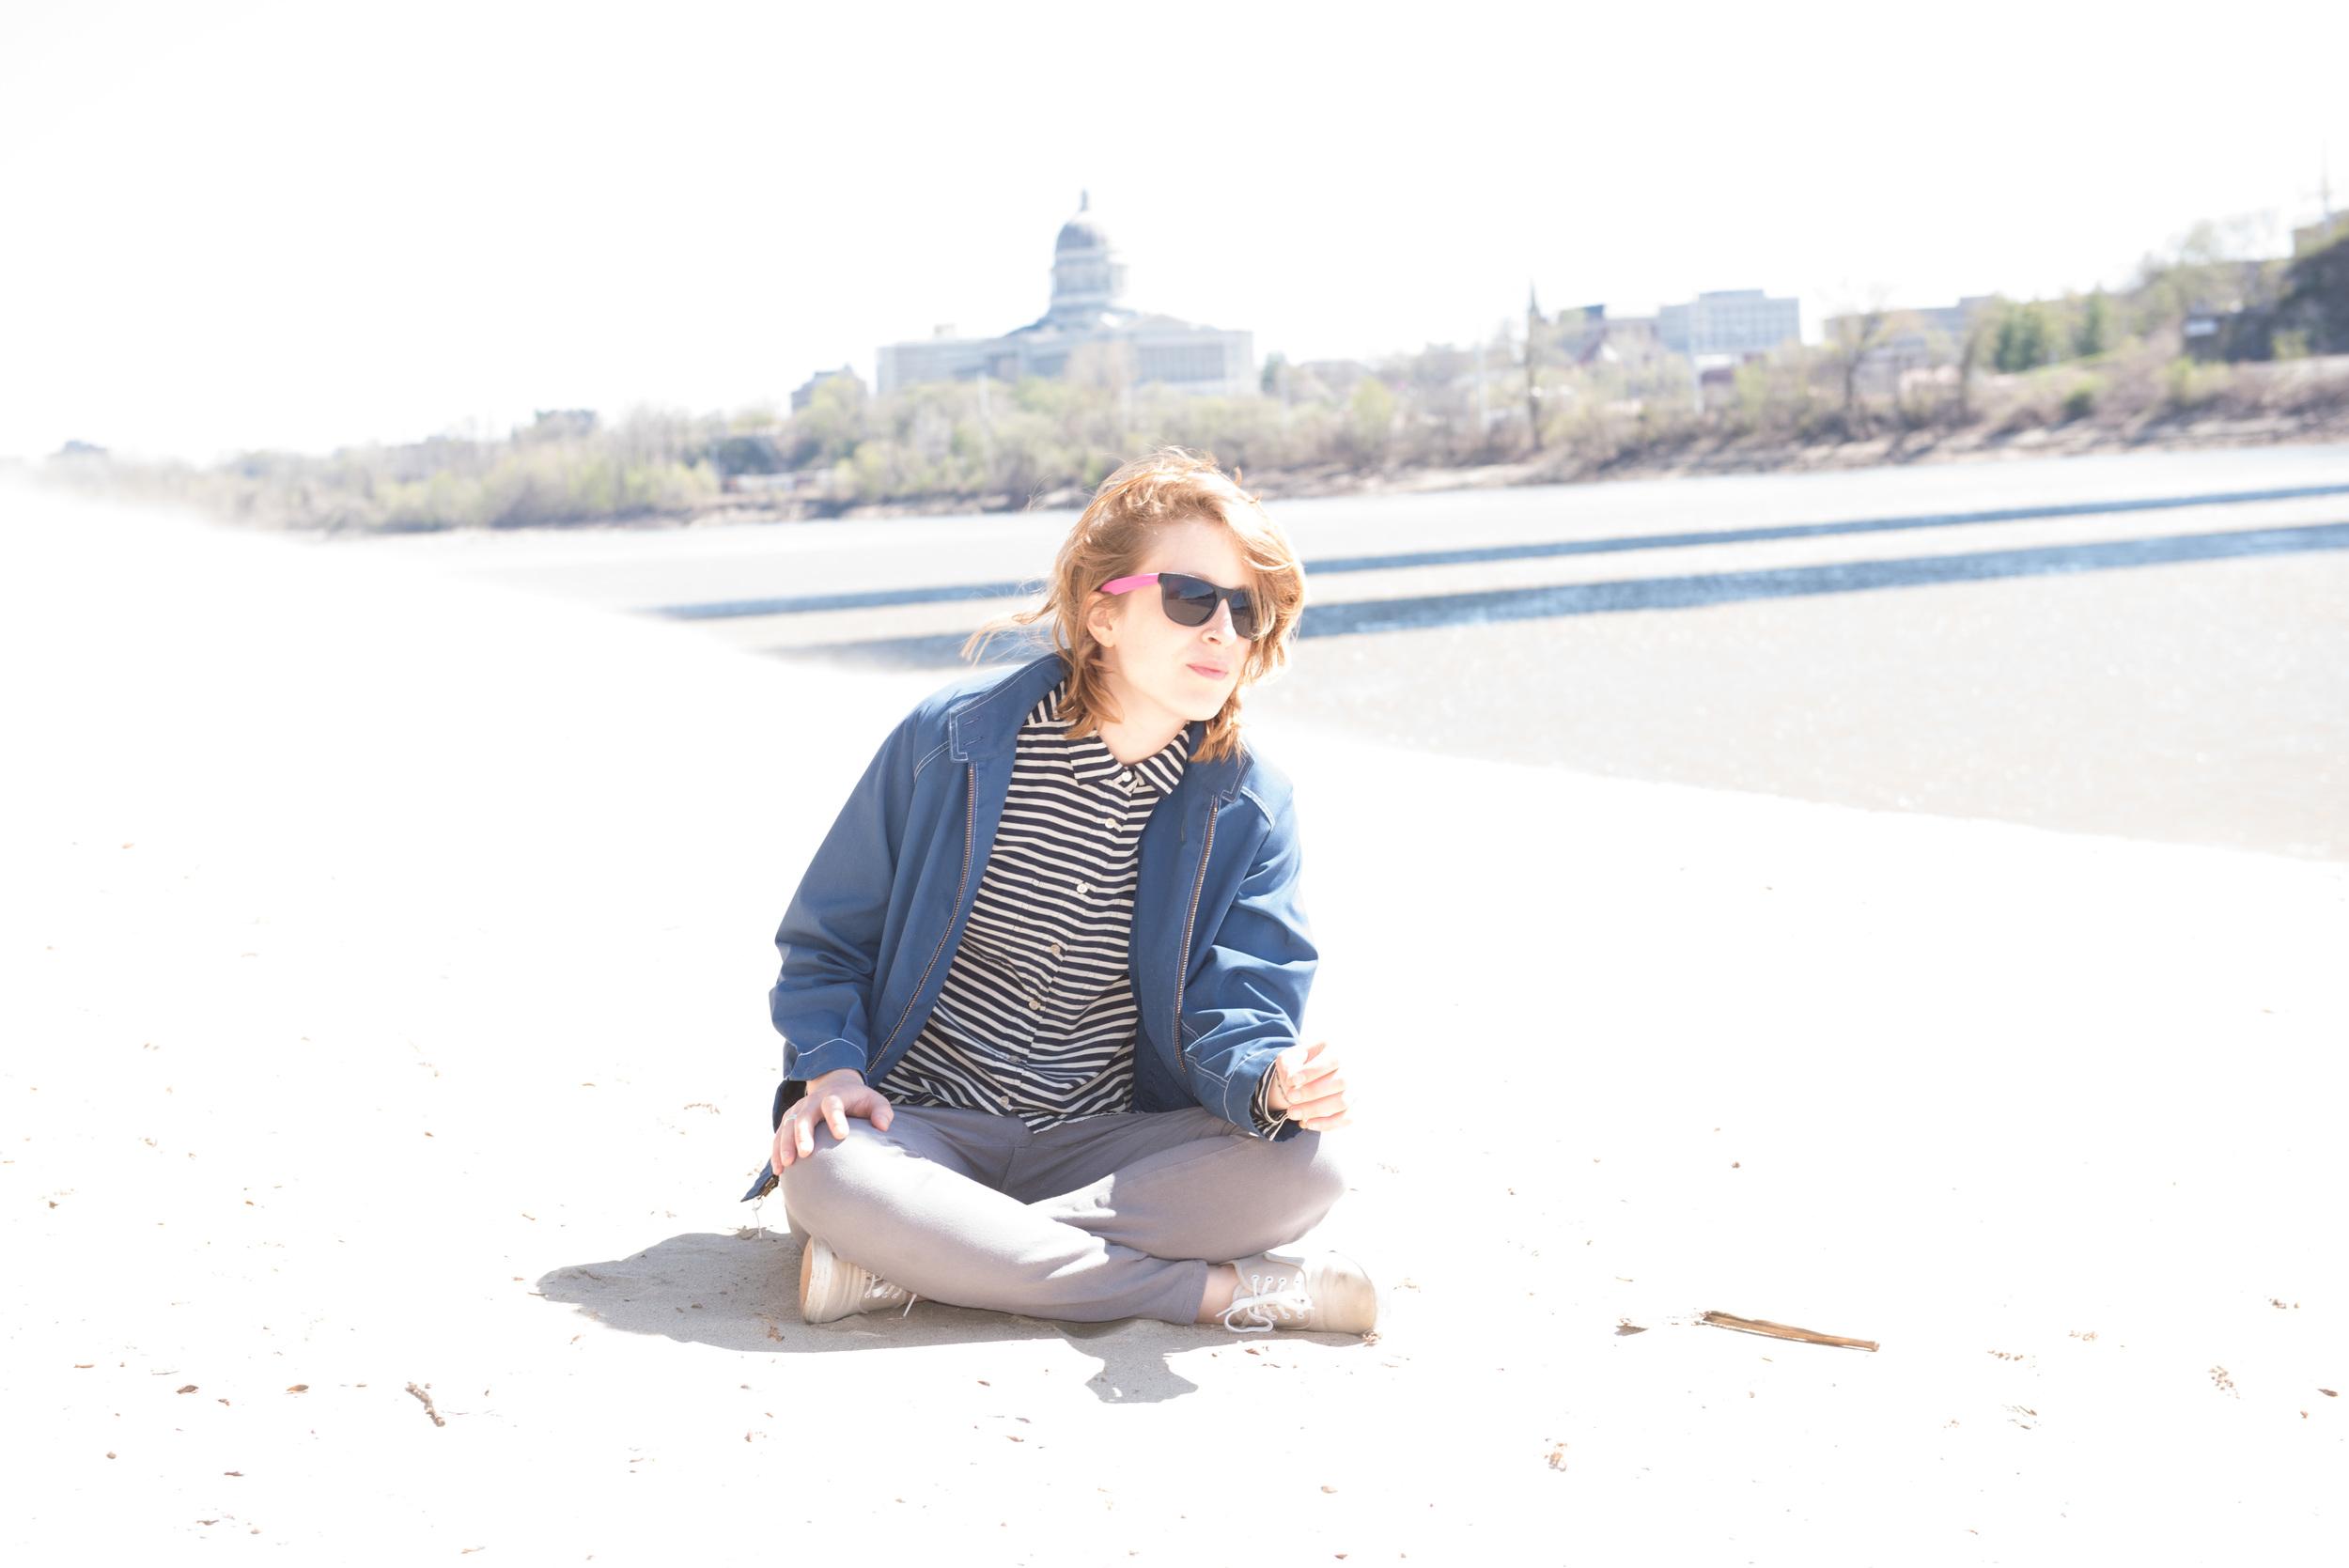 RaeFitzgerald_Photo7byScottPeterson.jpg